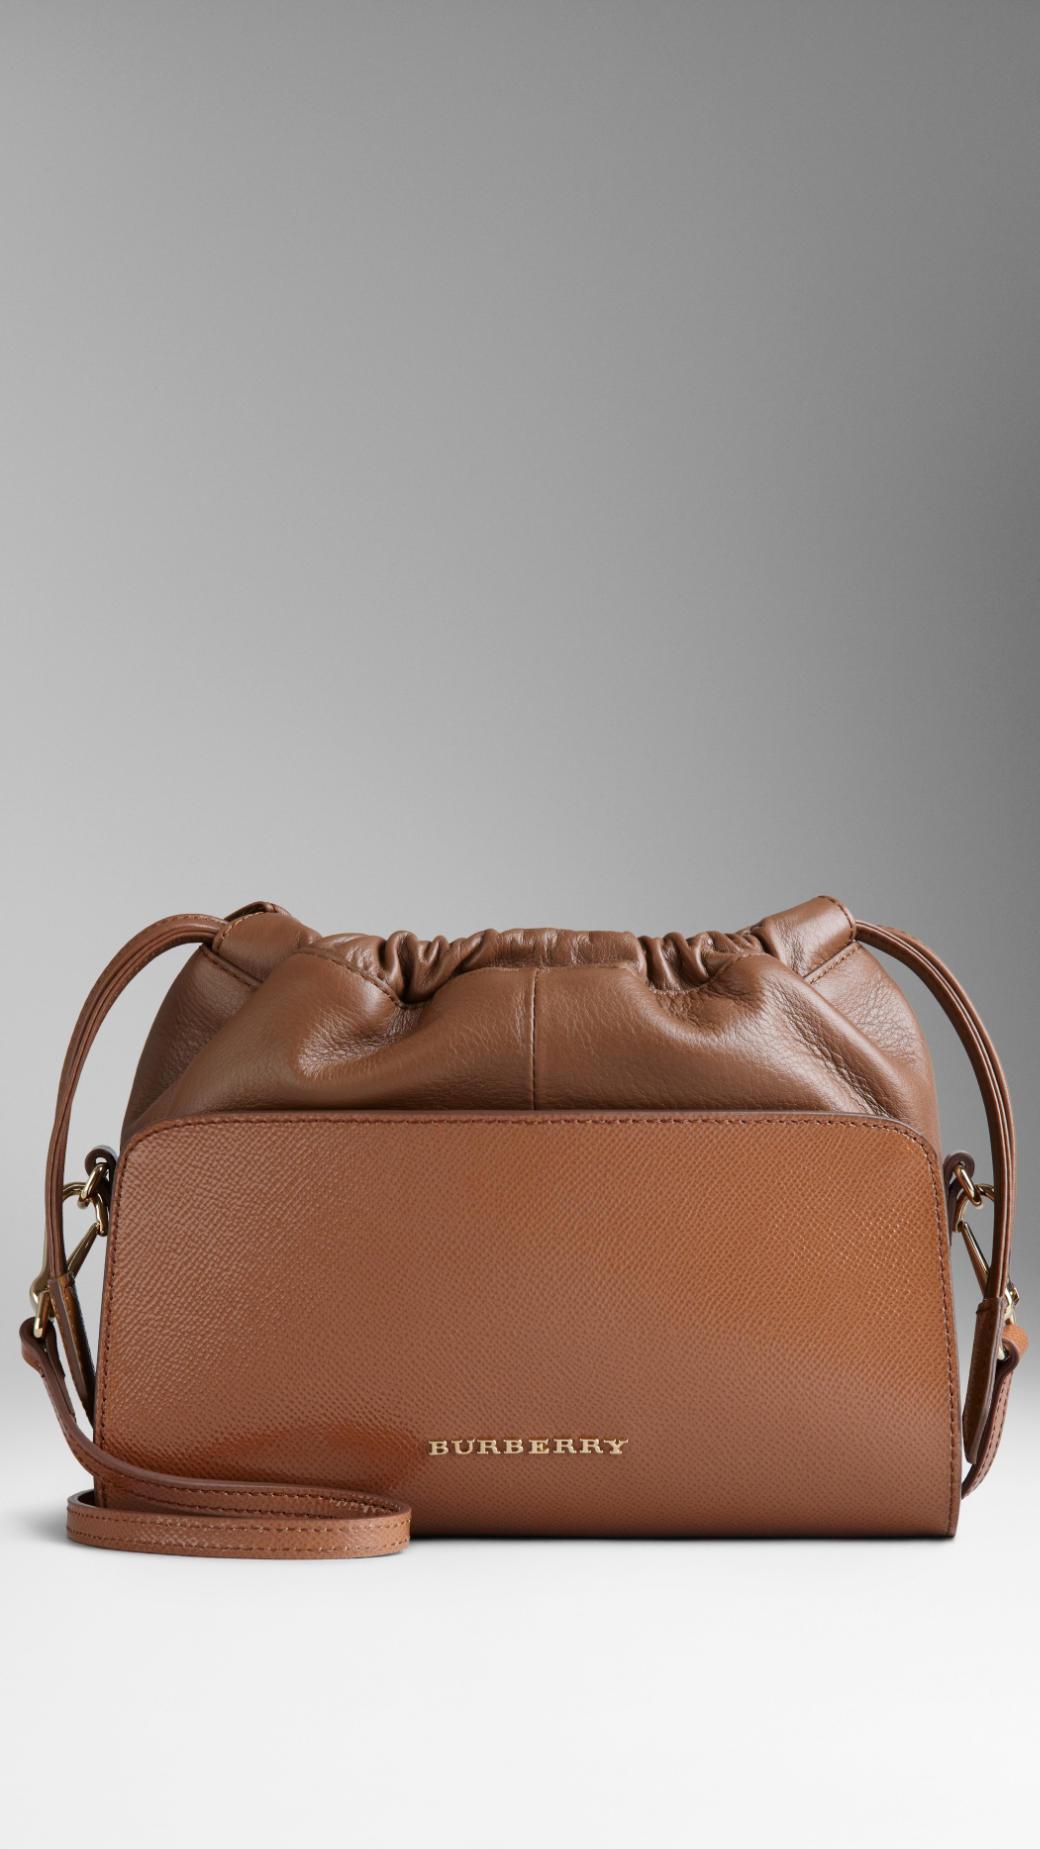 b0acb022e171 Burberry Mini Patent London Leather Crossbody Bag in Brown - Lyst